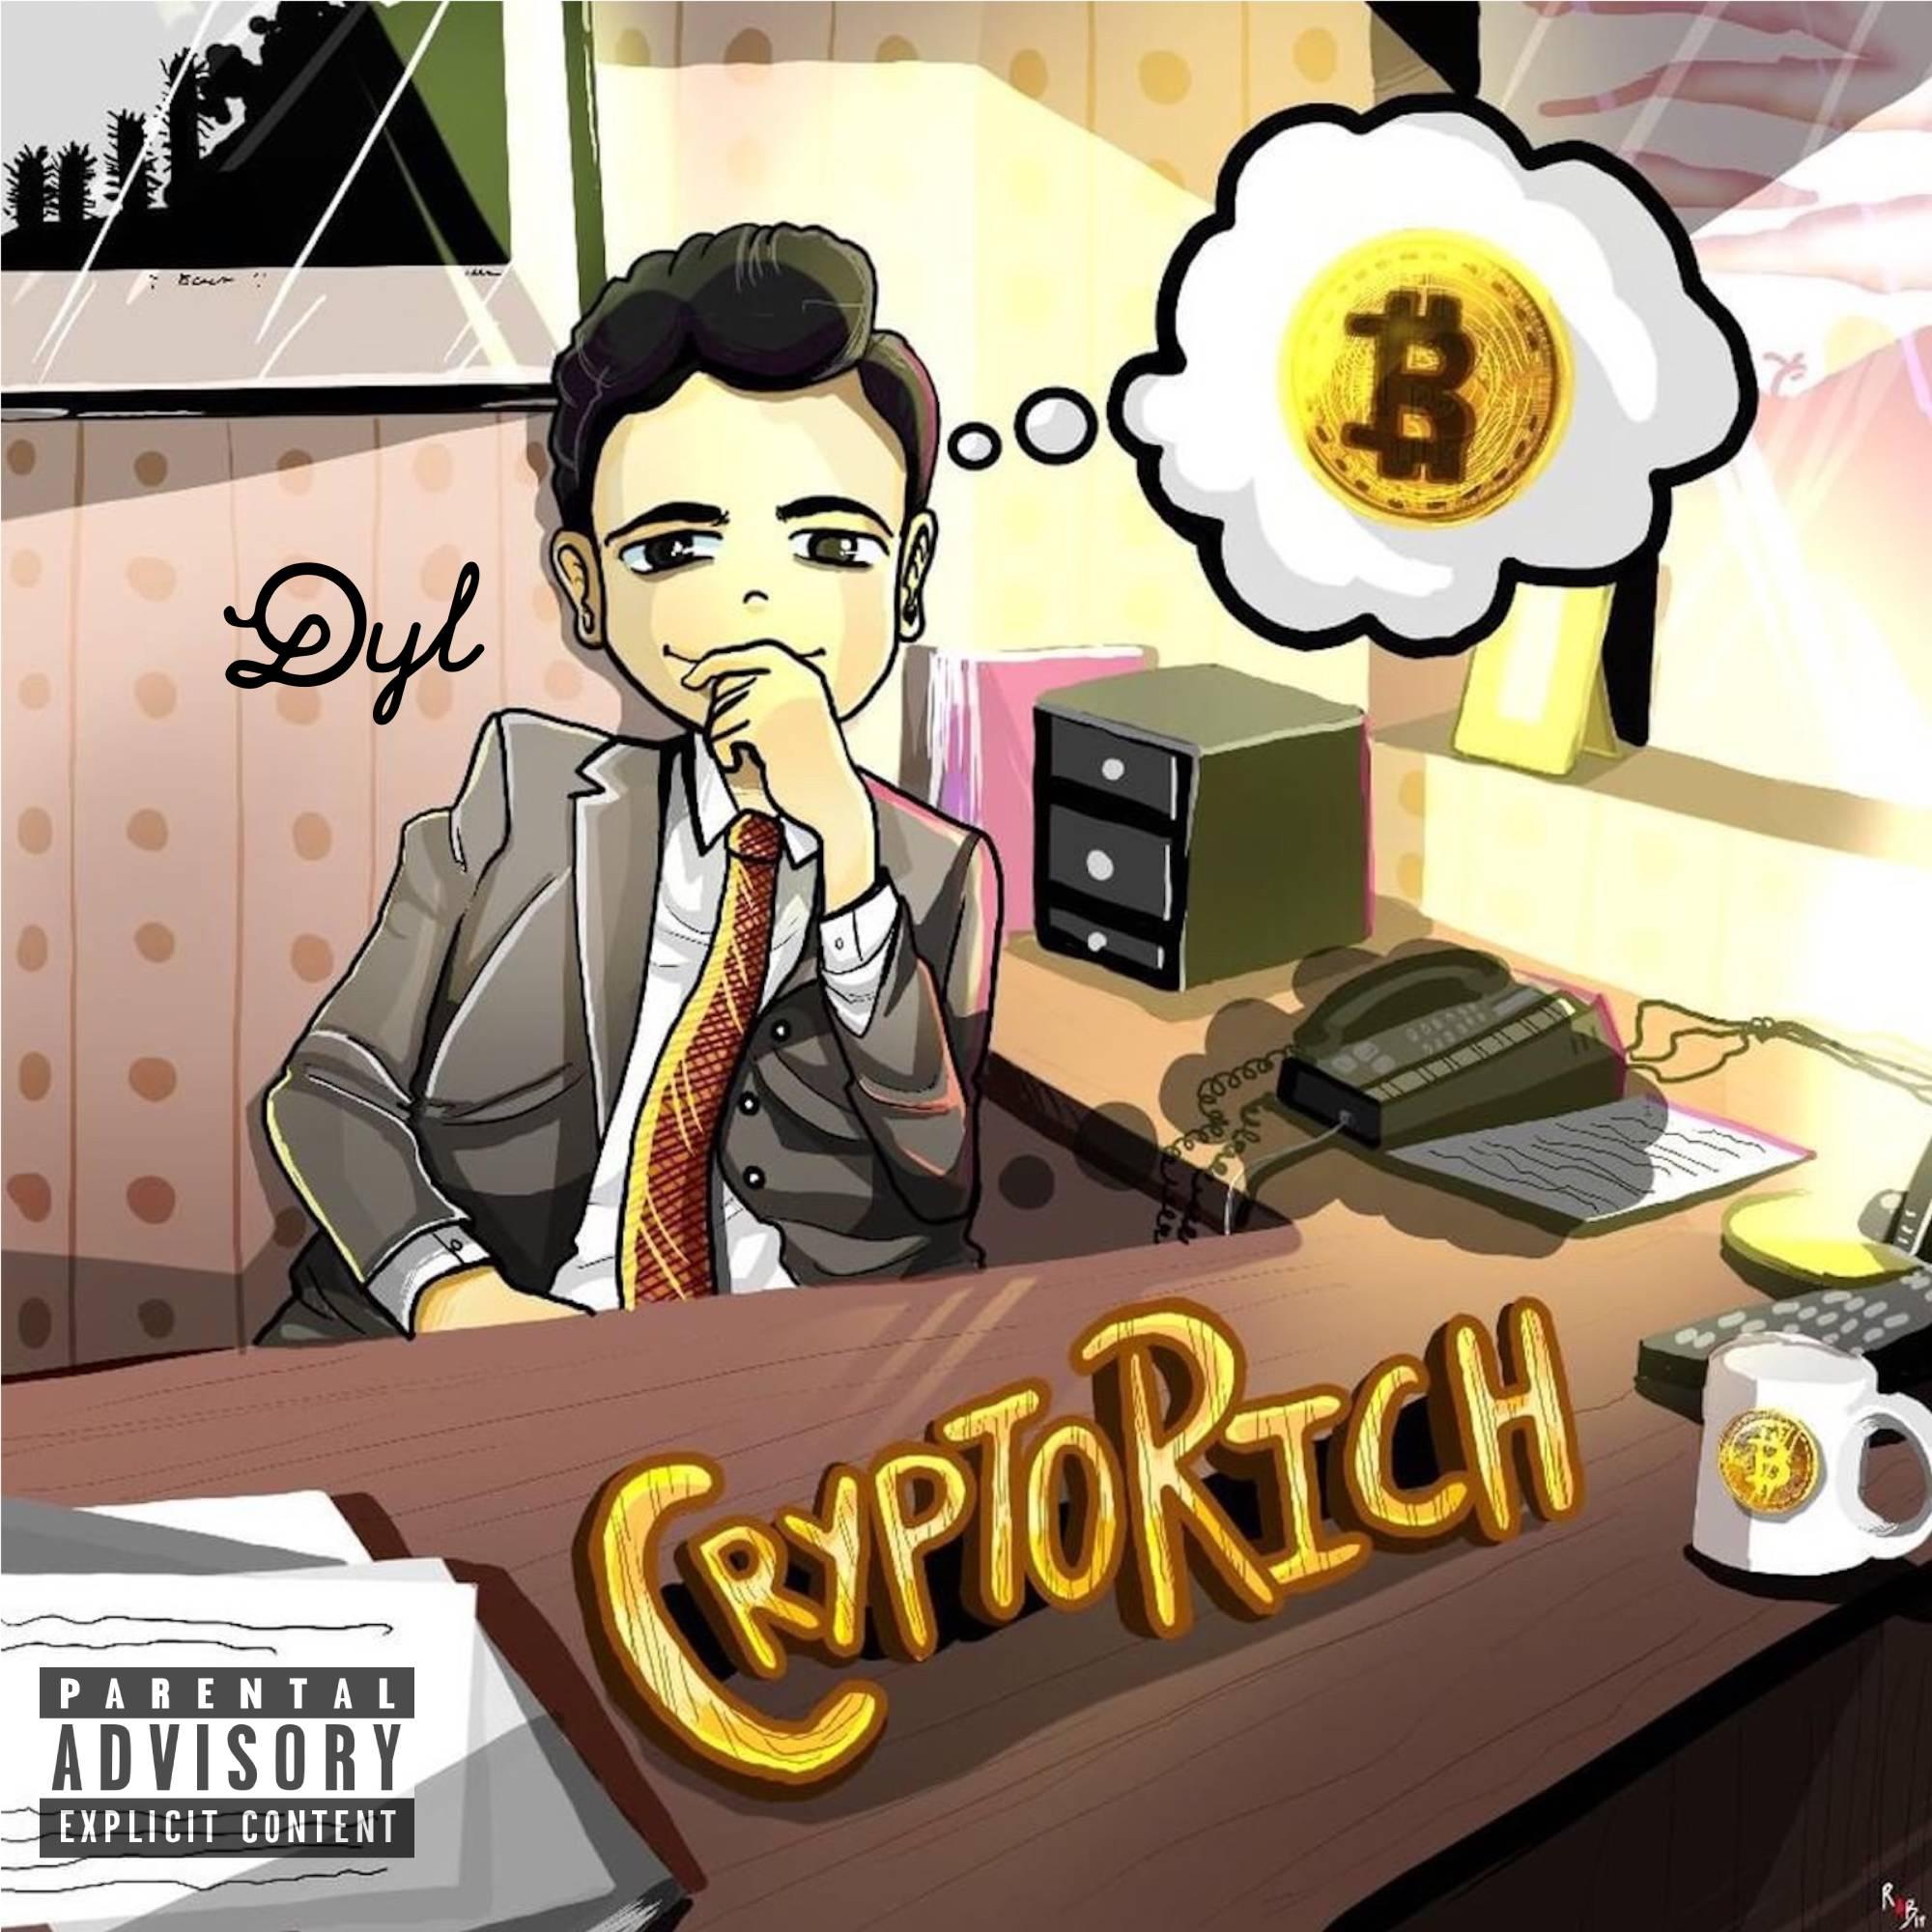 CryptoRichAlbumCover.jpg